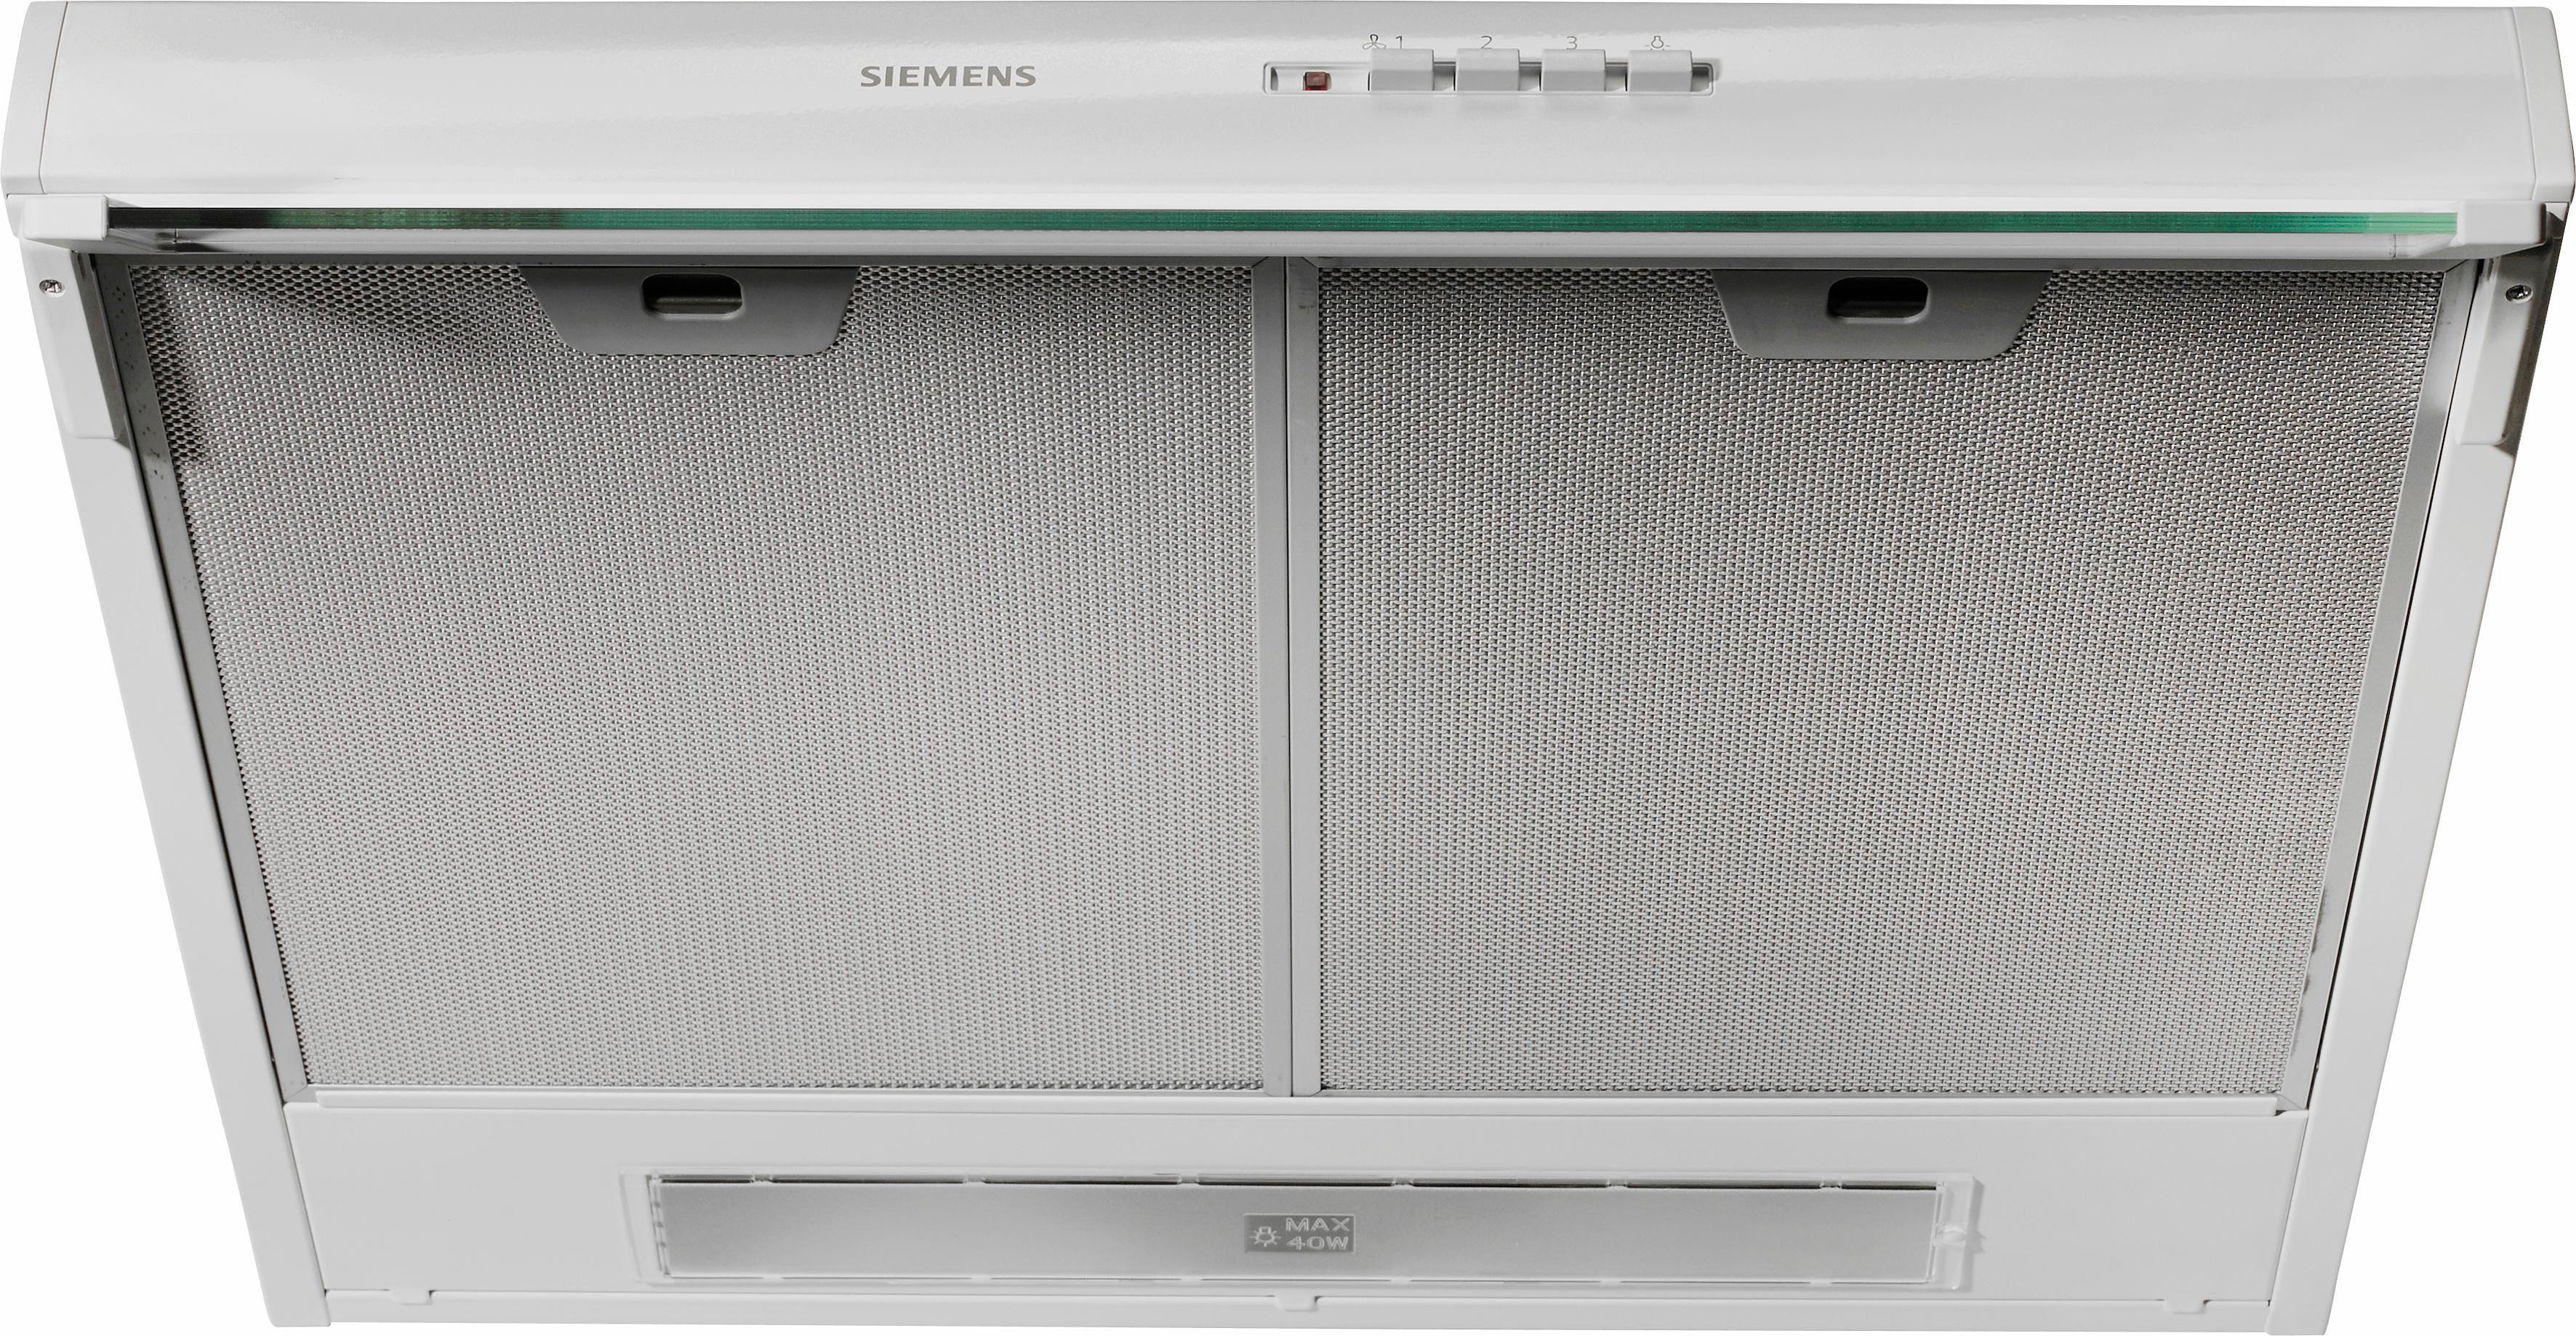 Siemens dunstabzugshaube otto dunstabzugshaube test u